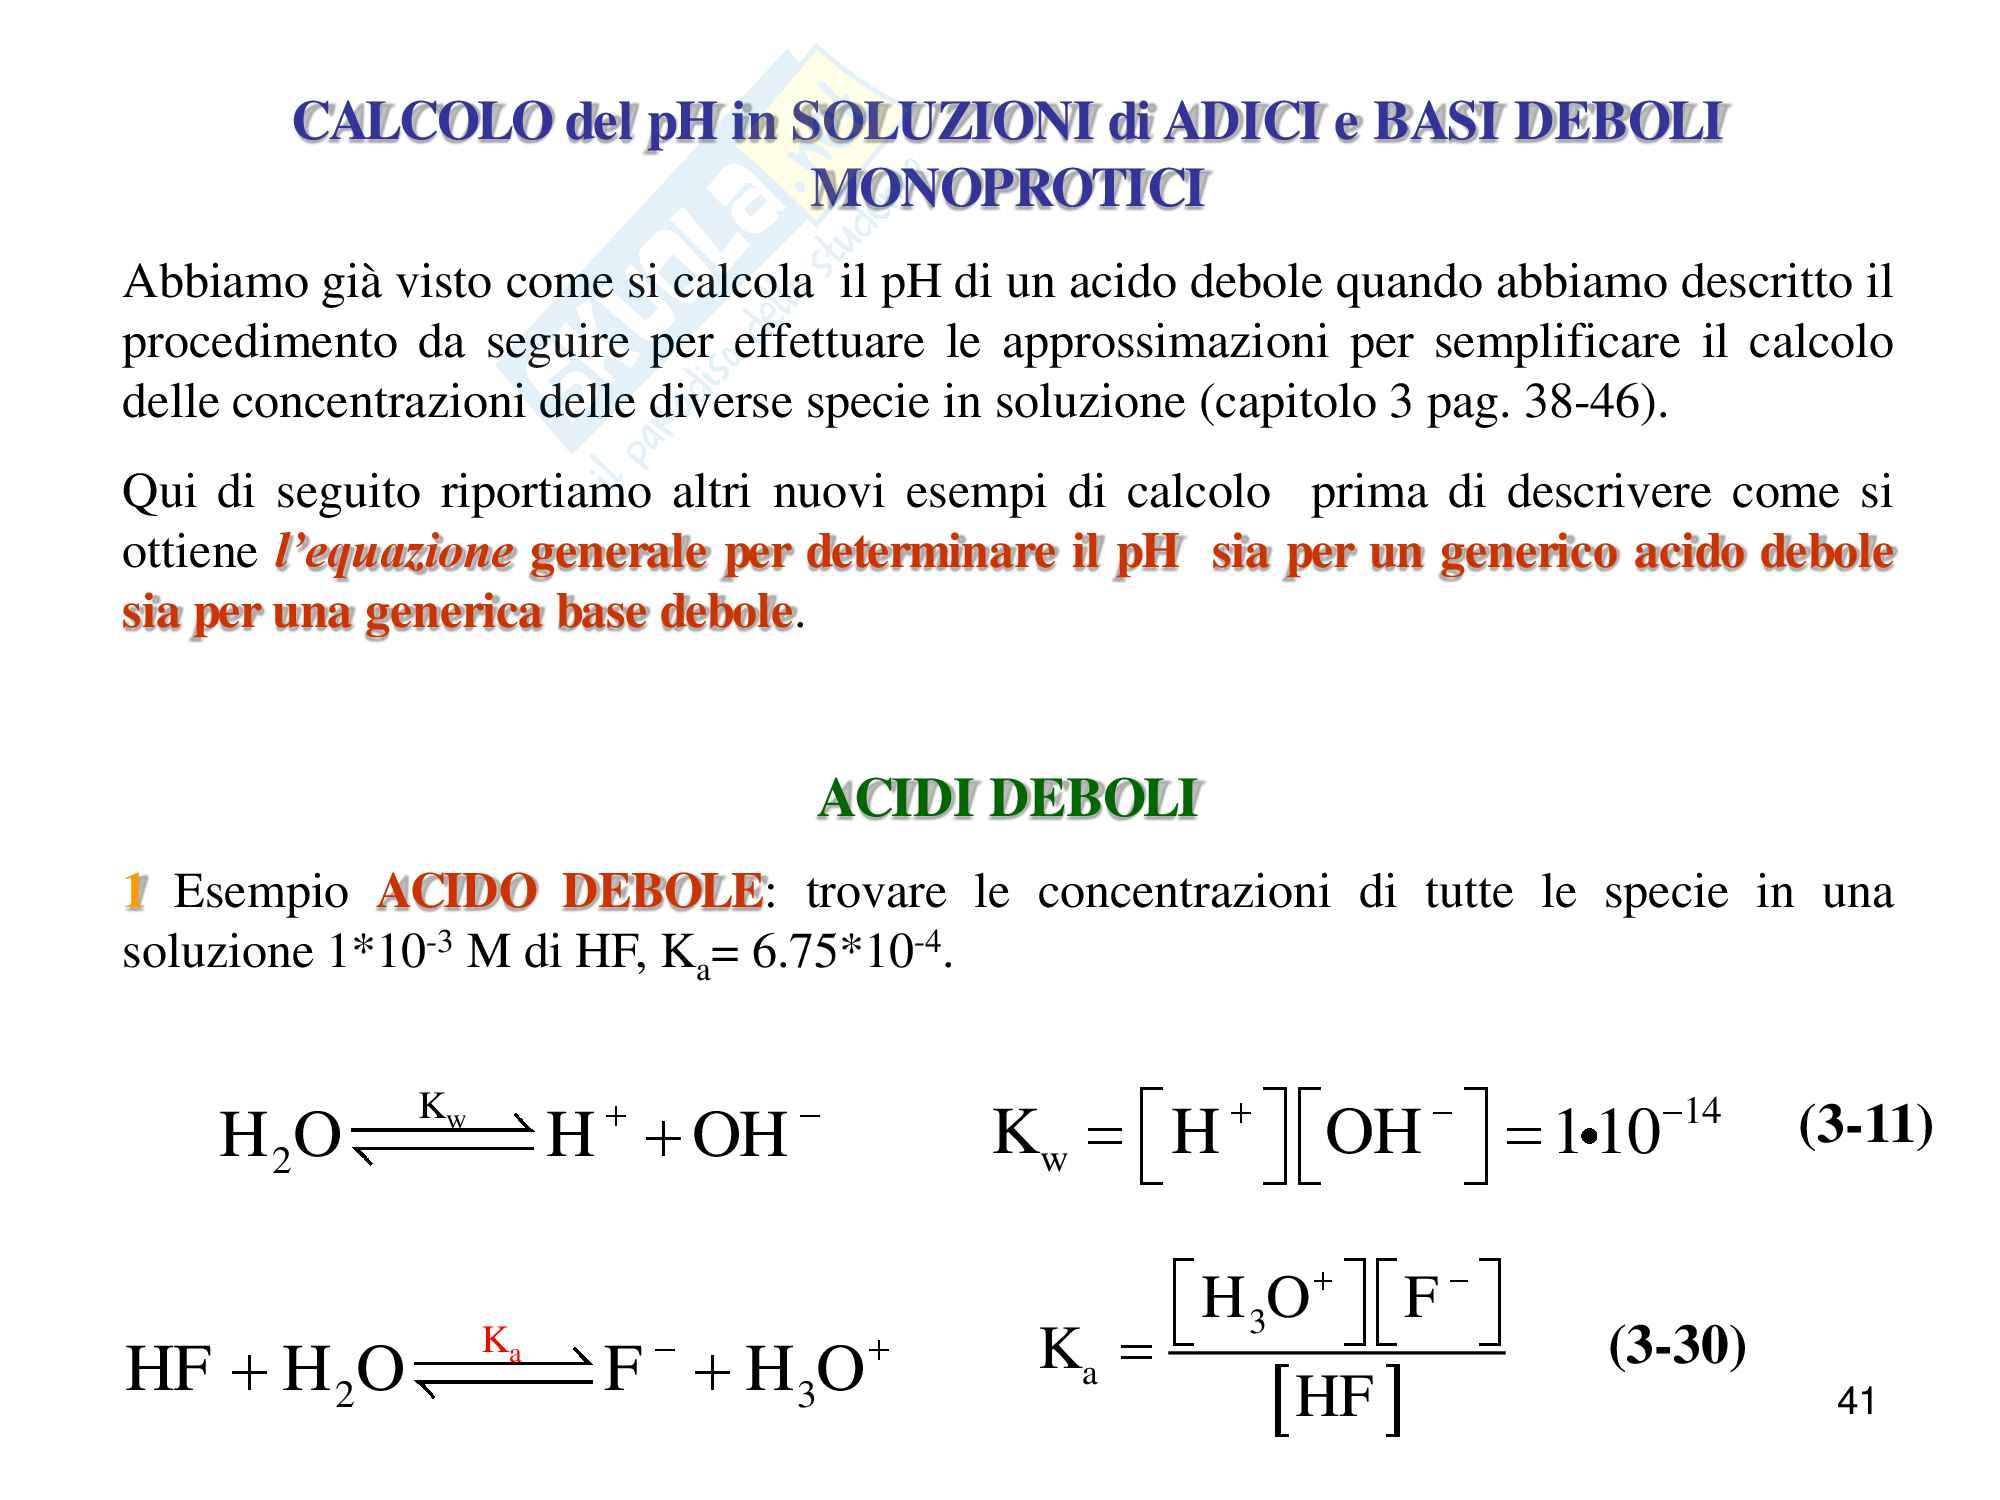 Chimica analitica, equilibrio acido base Pag. 41